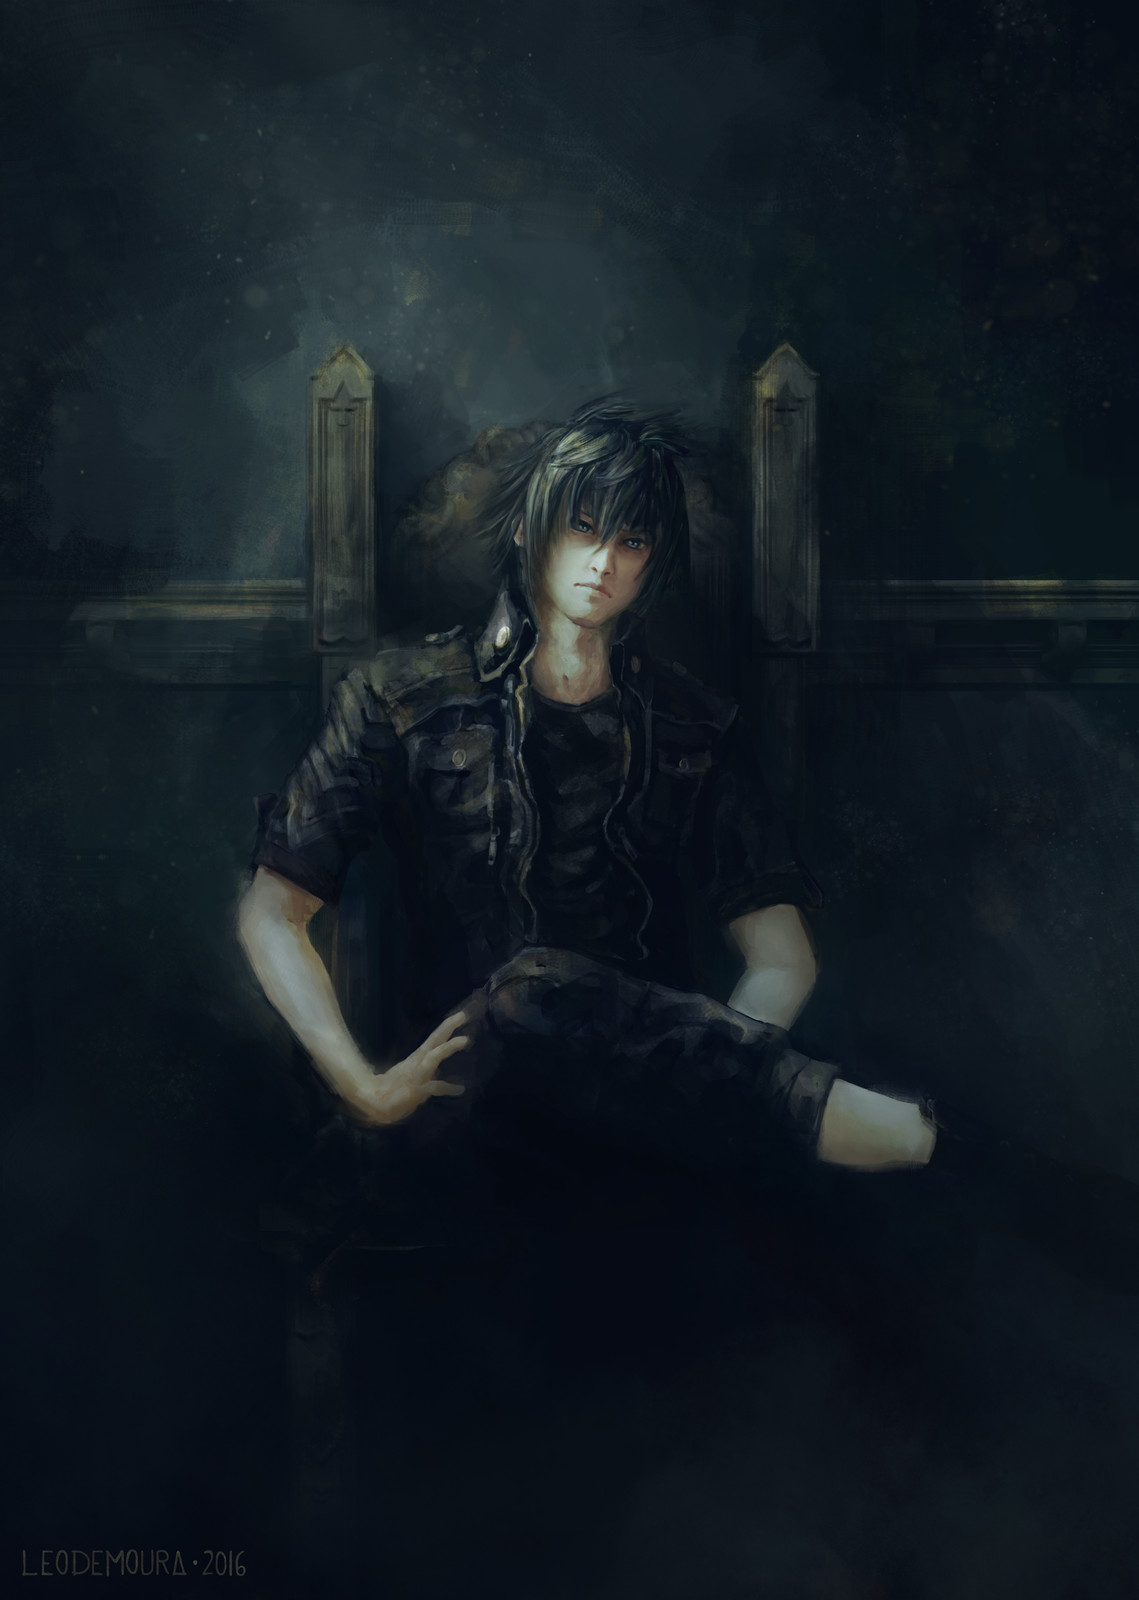 [Fanart] Noctis - Final Fantasy XV